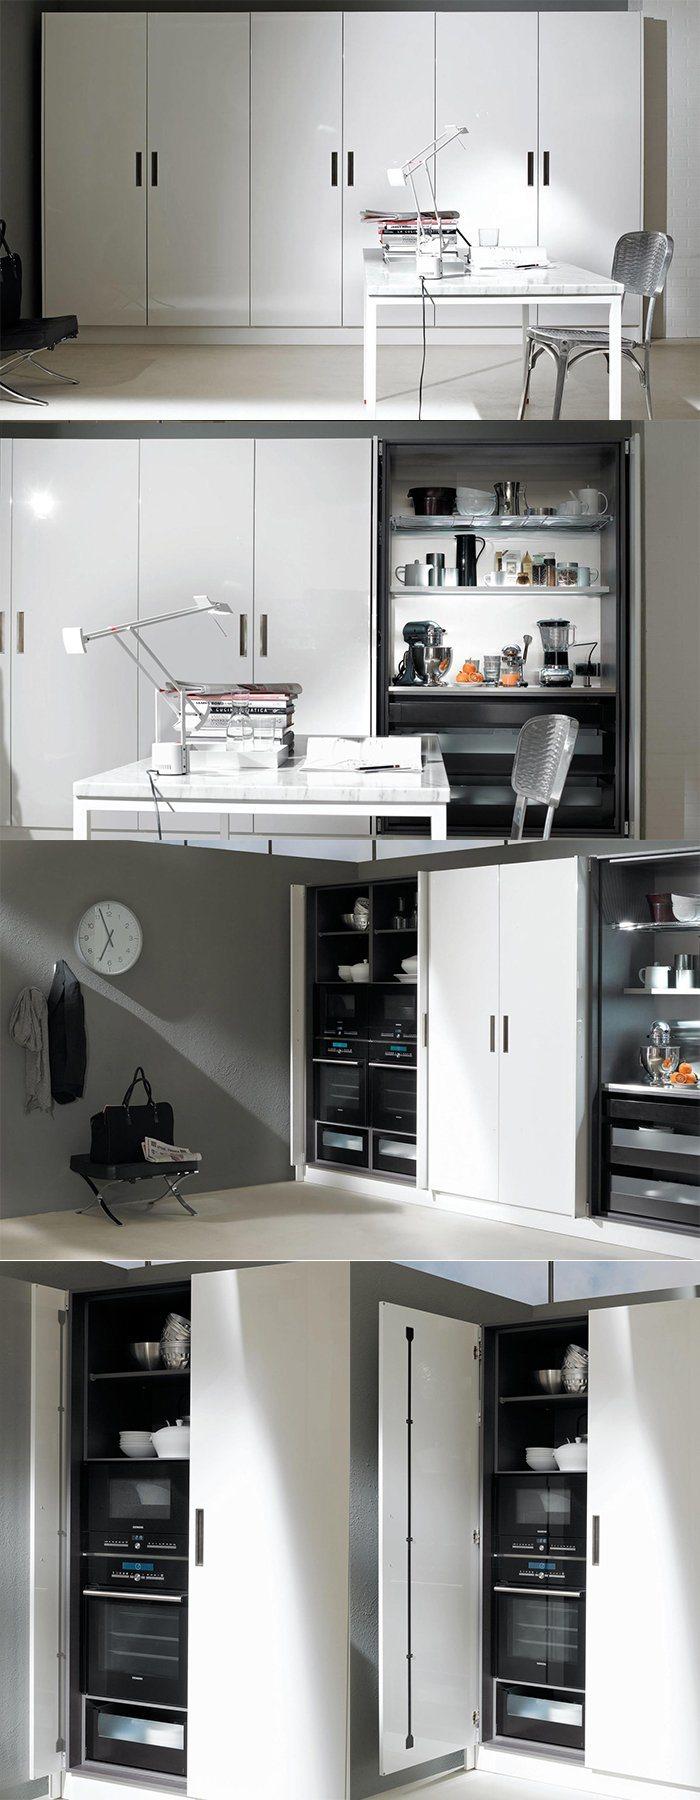 China Top Quality Custom Made Guangzhou Kitchen Cabinets Blk 38